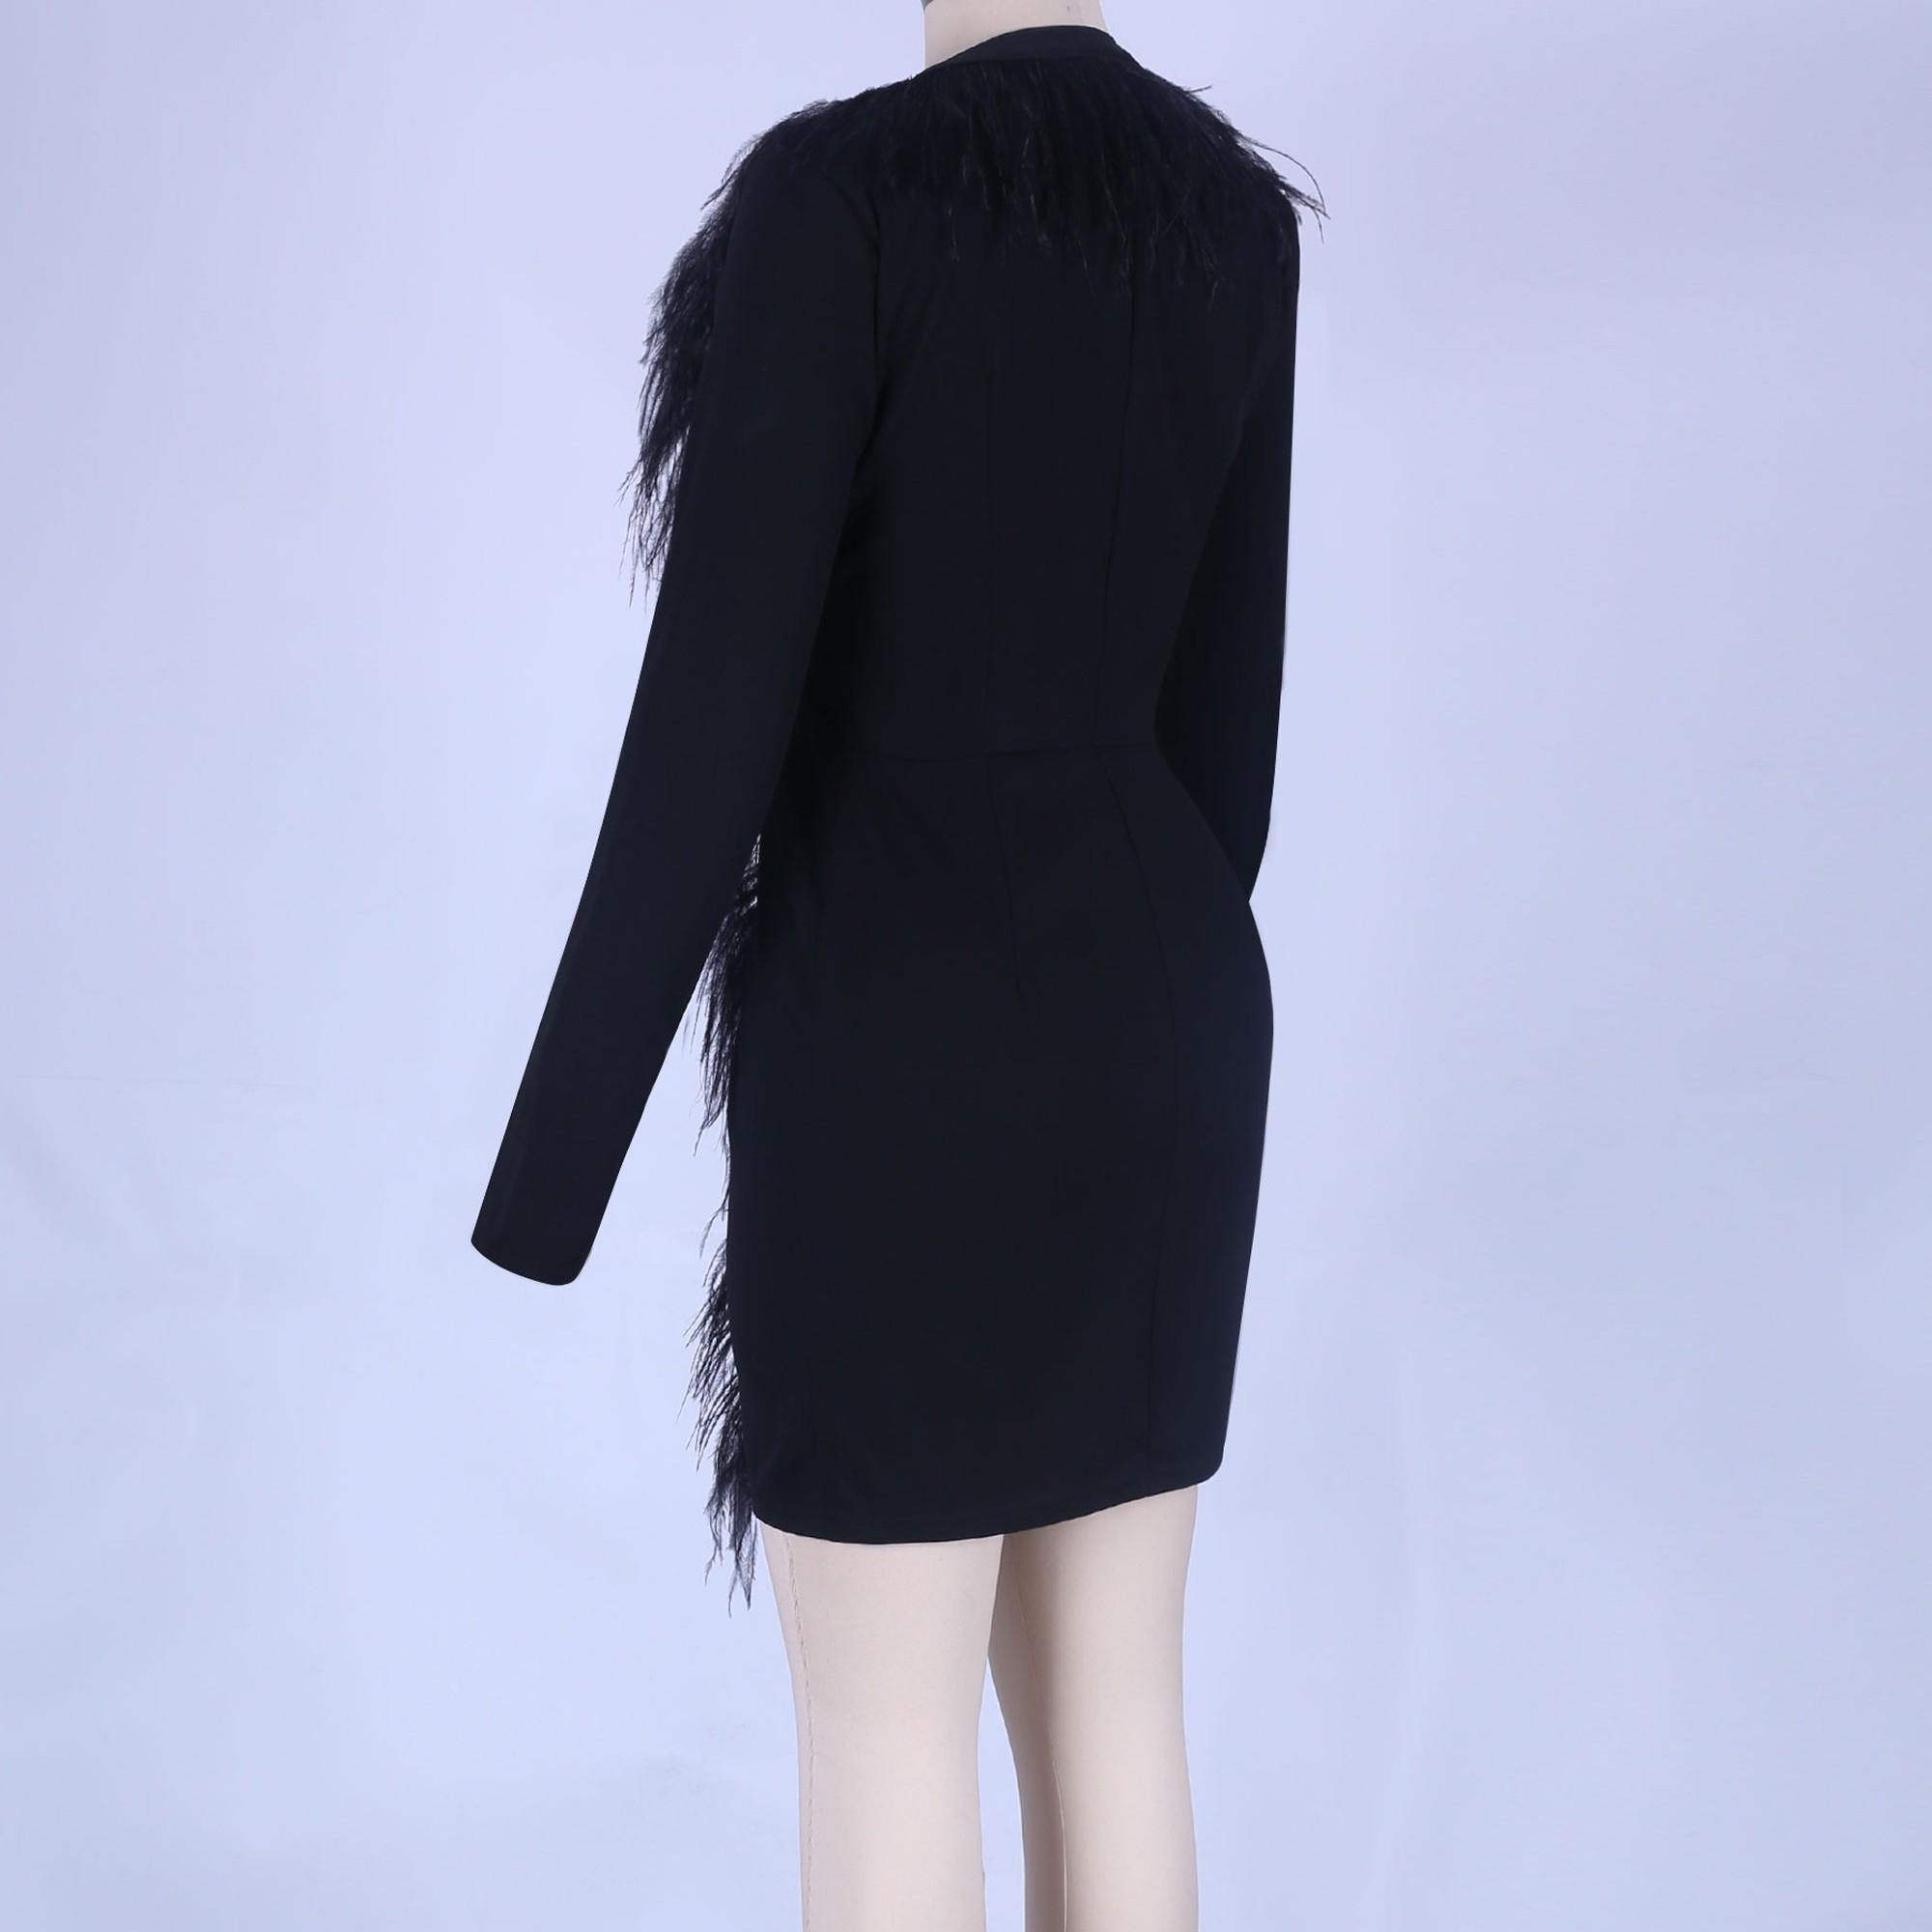 Black V Neck Long Sleeve Mini Fur Sexy Bodycon Dress FSY001-Black